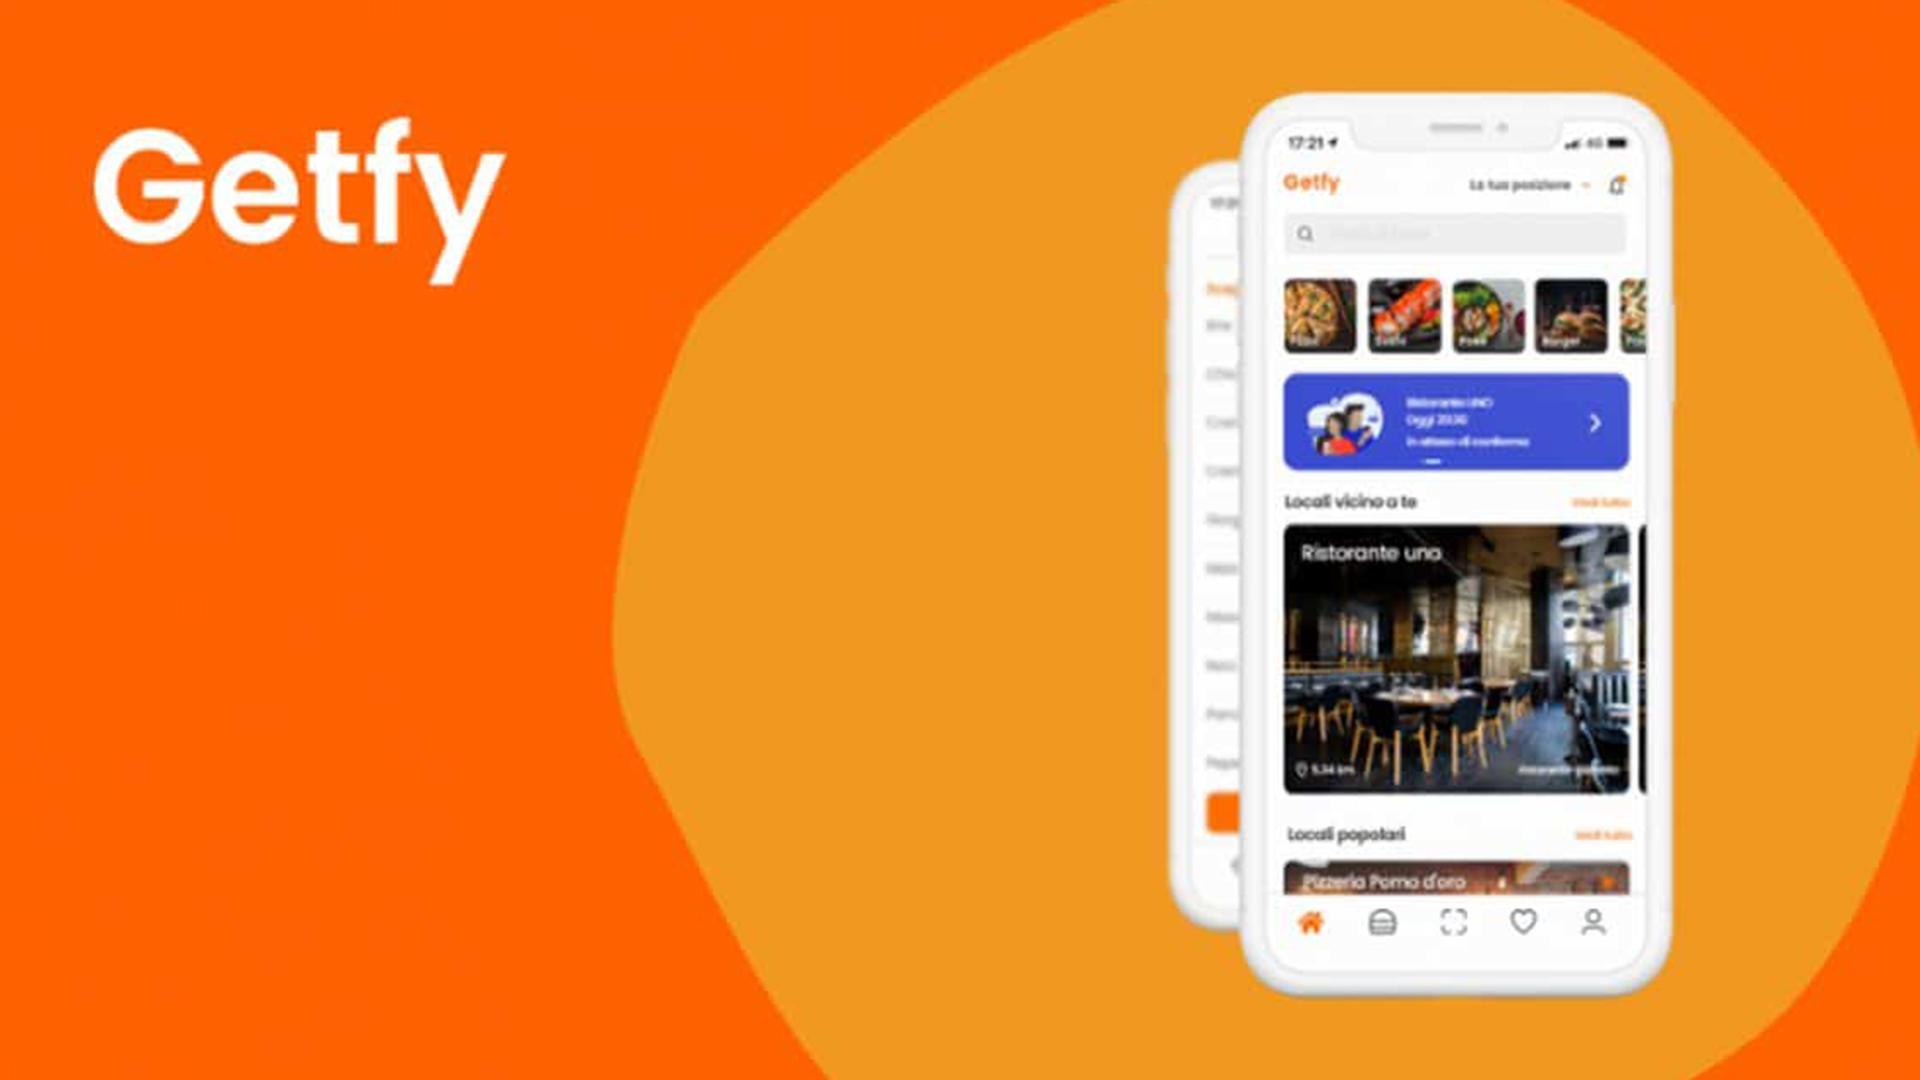 App-Gefty